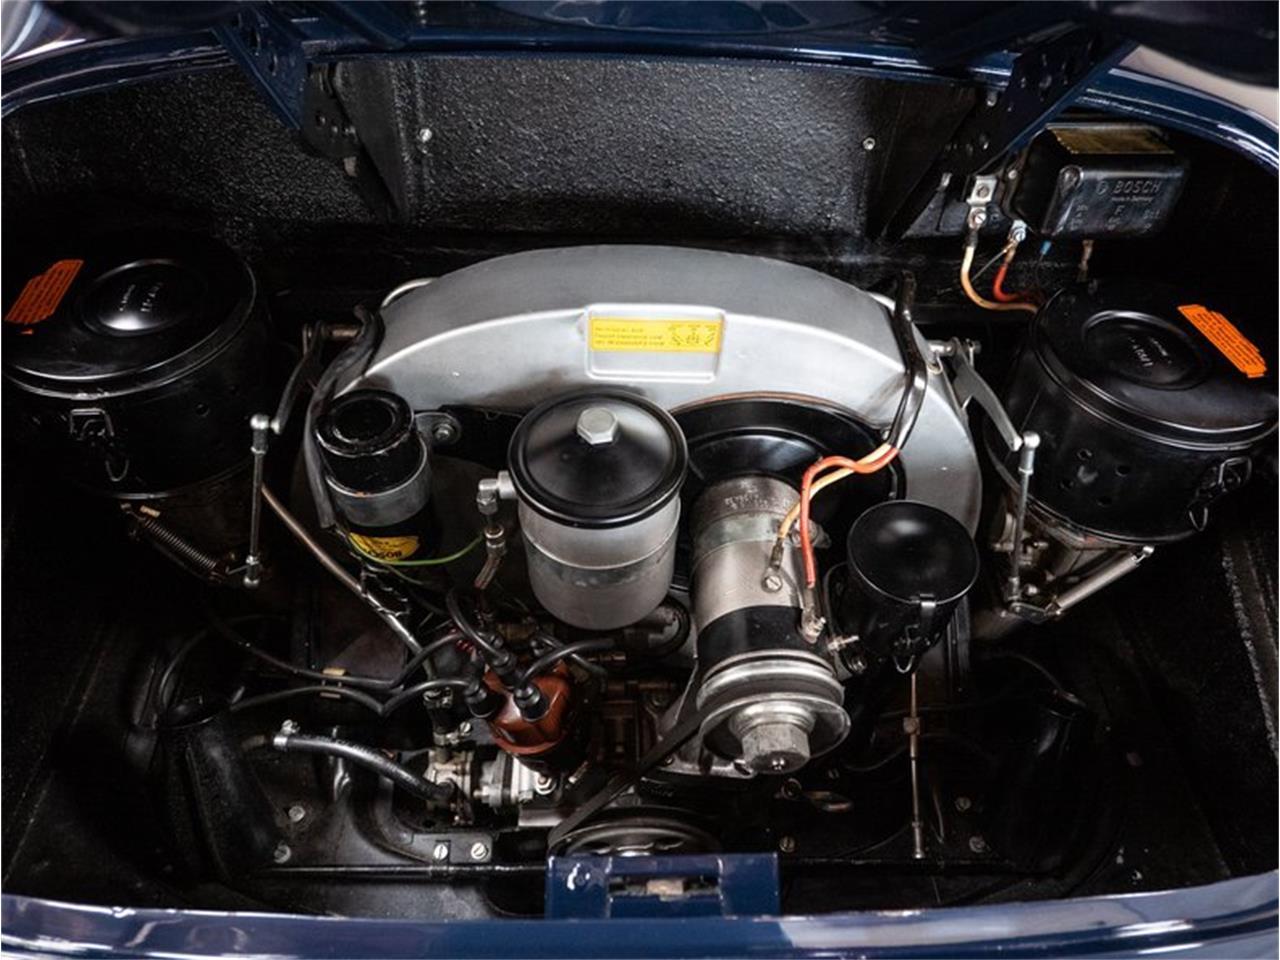 1960 Porsche 356 (CC-1310261) for sale in Fallbrook, California